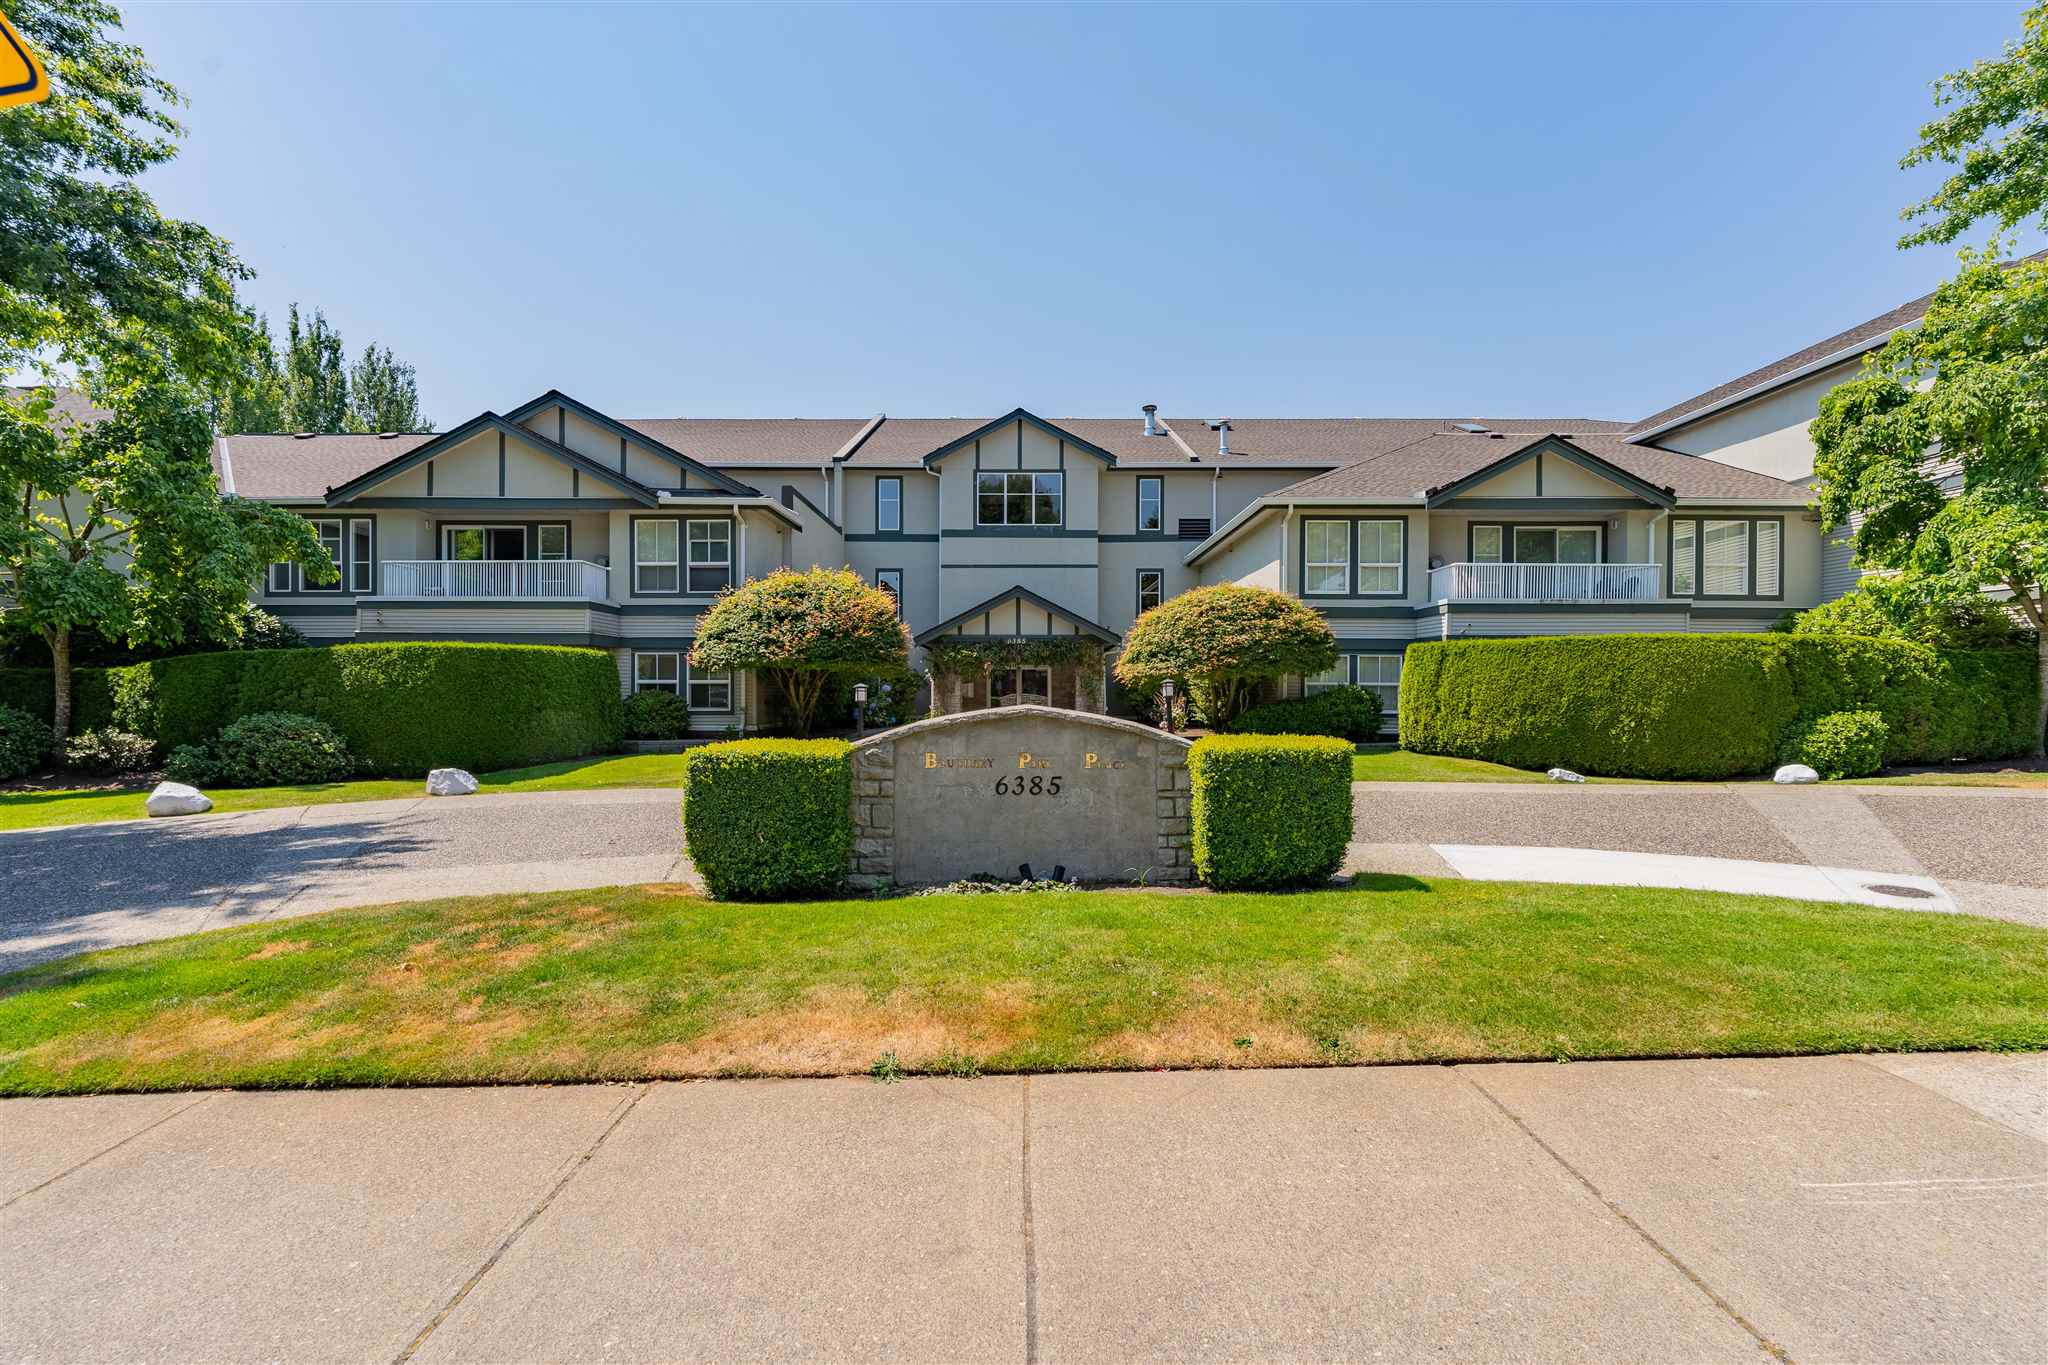 112 6385 121 STREET - Panorama Ridge Apartment/Condo for sale, 2 Bedrooms (R2601781) - #1